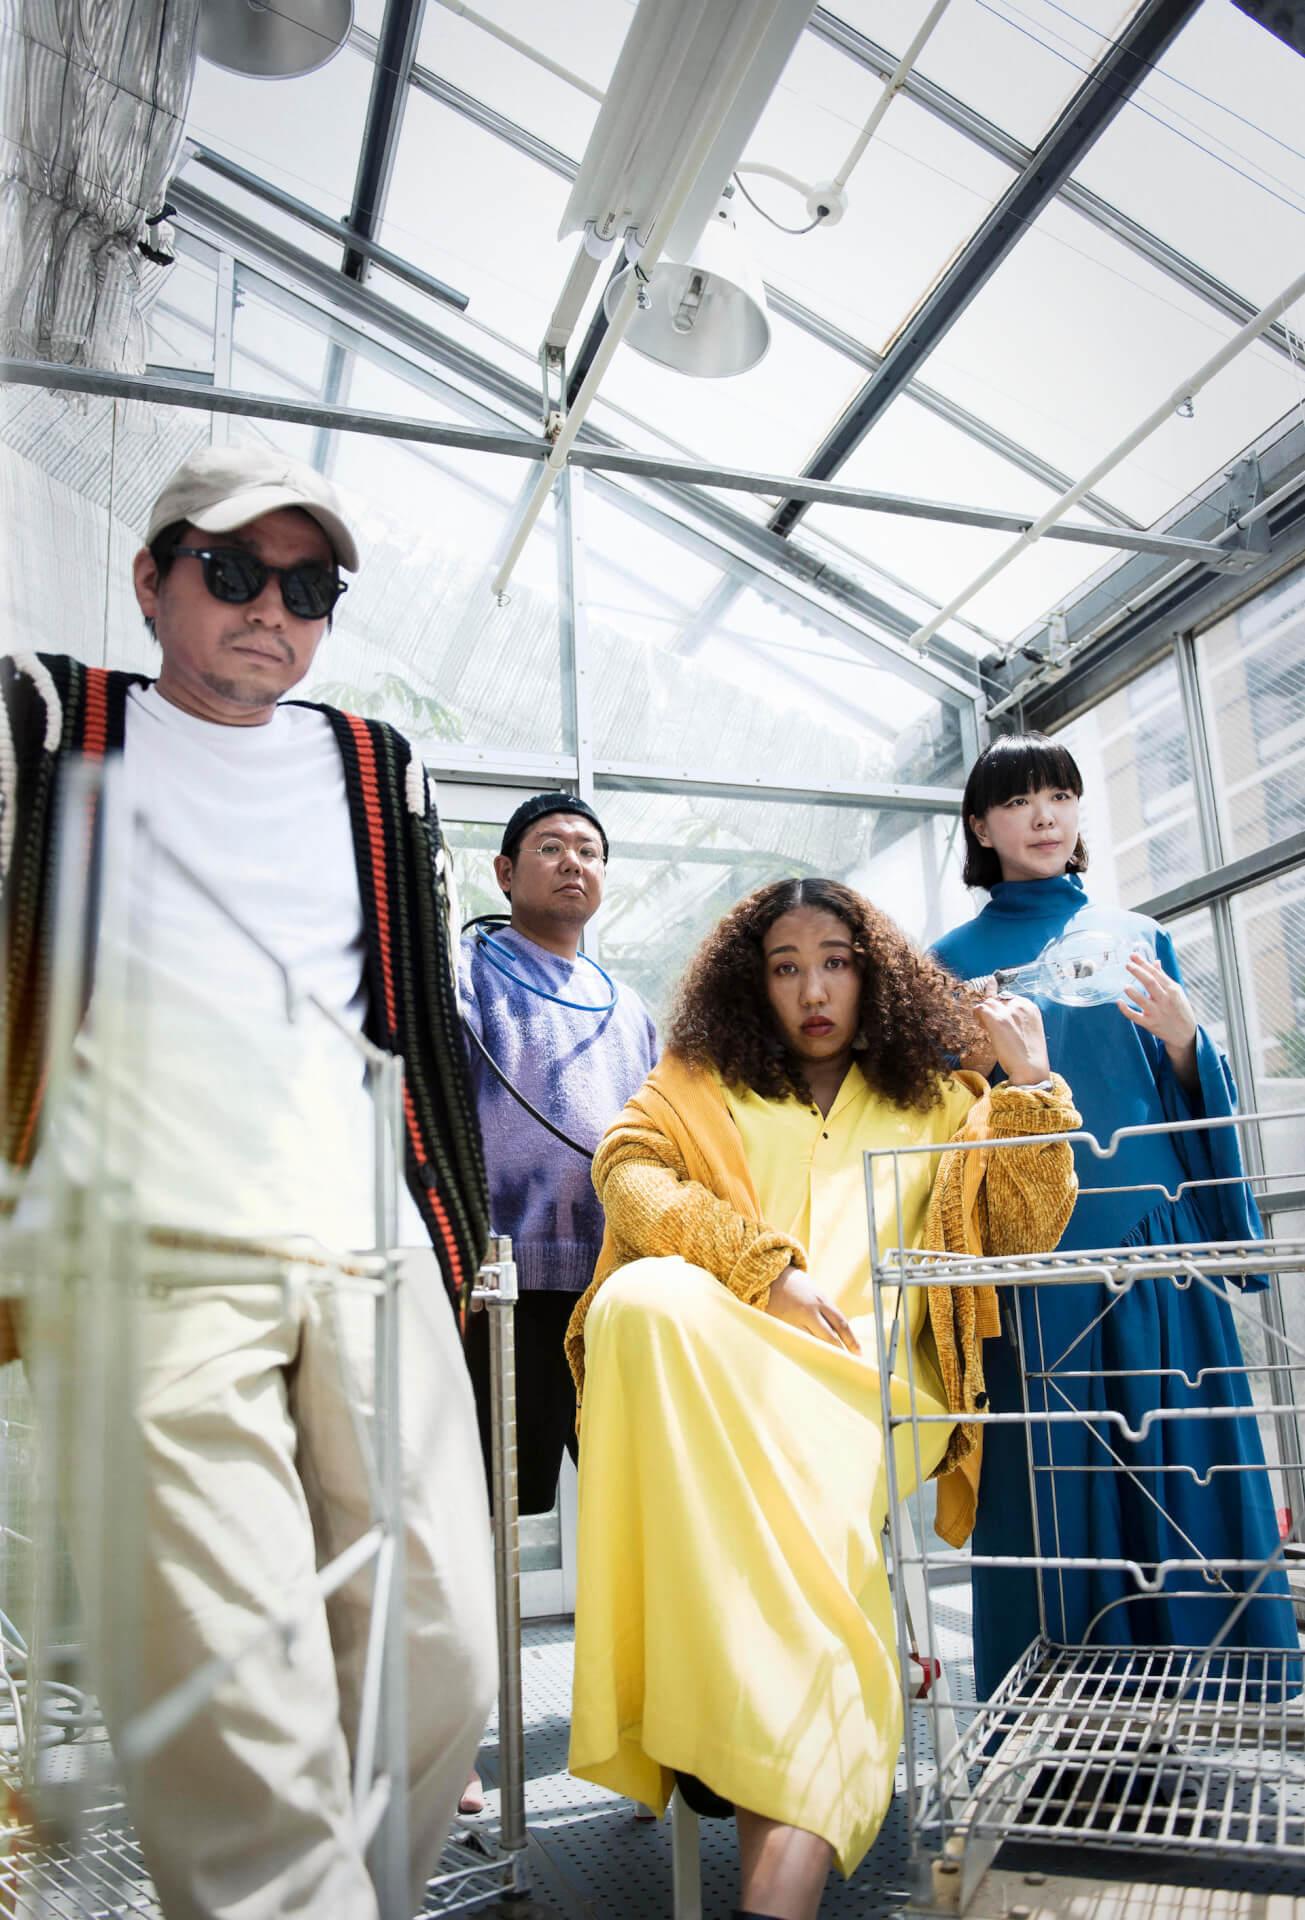 LIQUIDROOM15周年公演にてtoeのワンマン公演が開催 オープニングアクトに、んoonが登場 music190712-liquidroom15th-toe-1